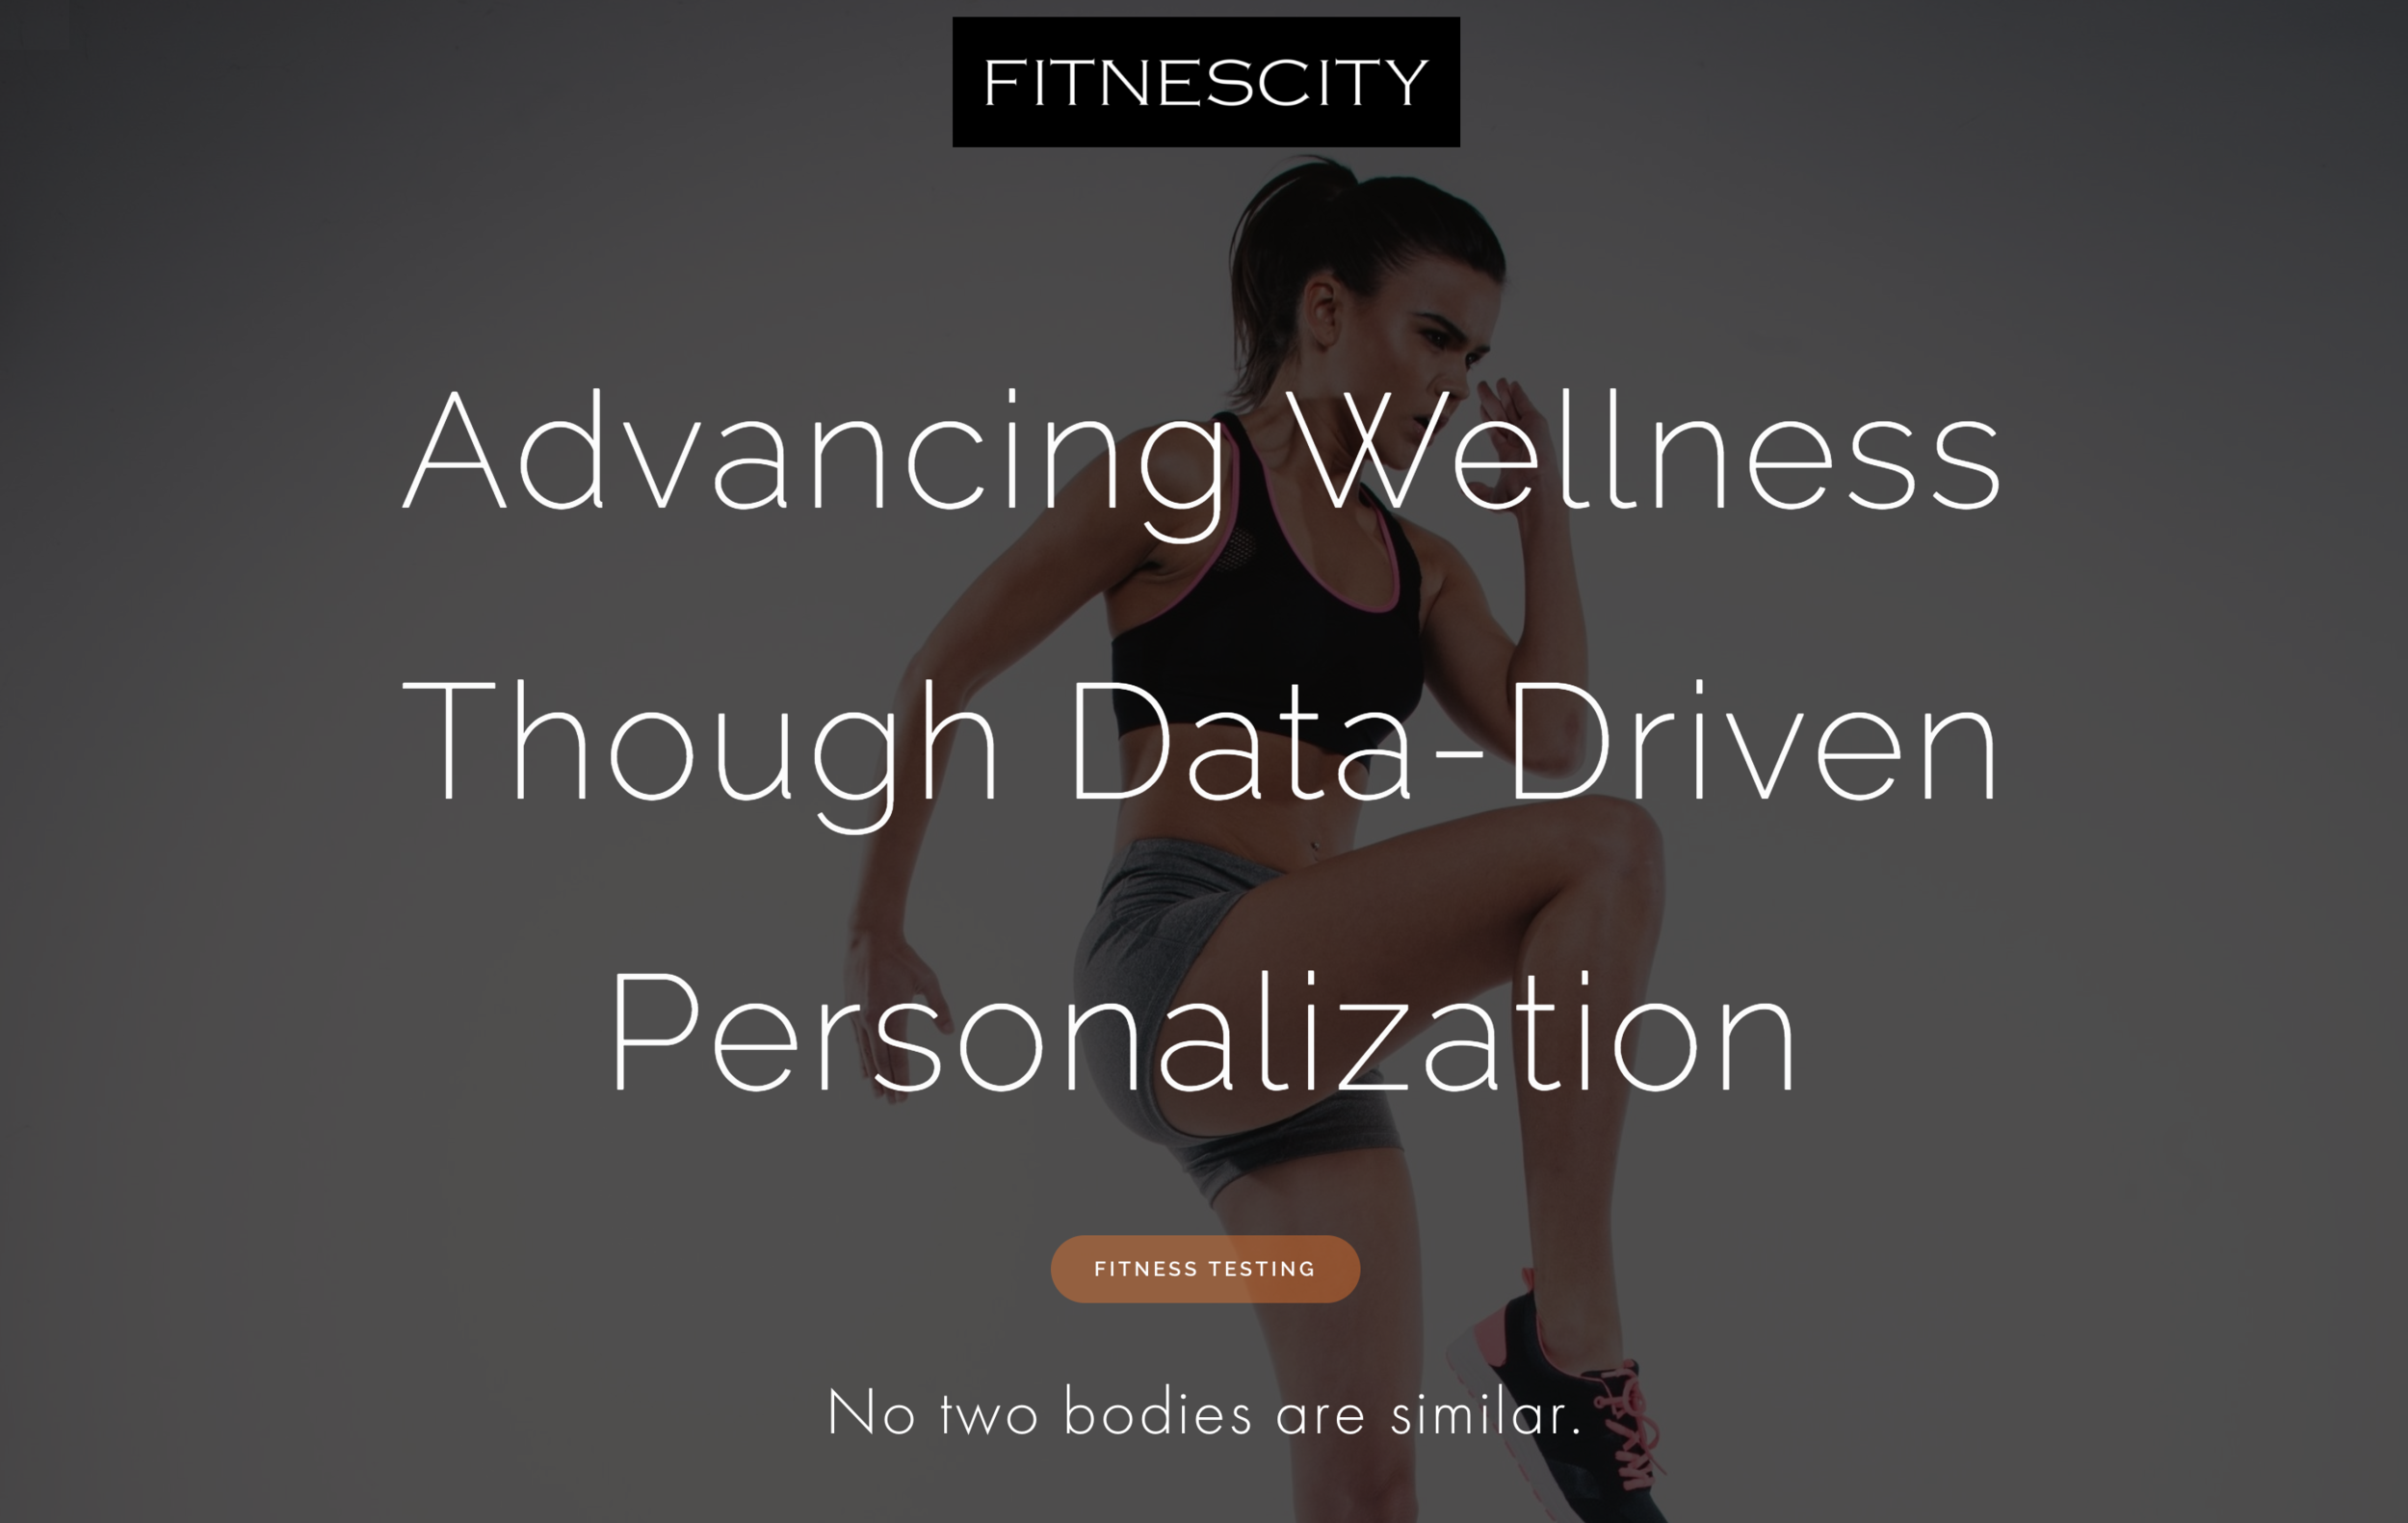 Advancing Wellness Through Data-Driven Personalization.png